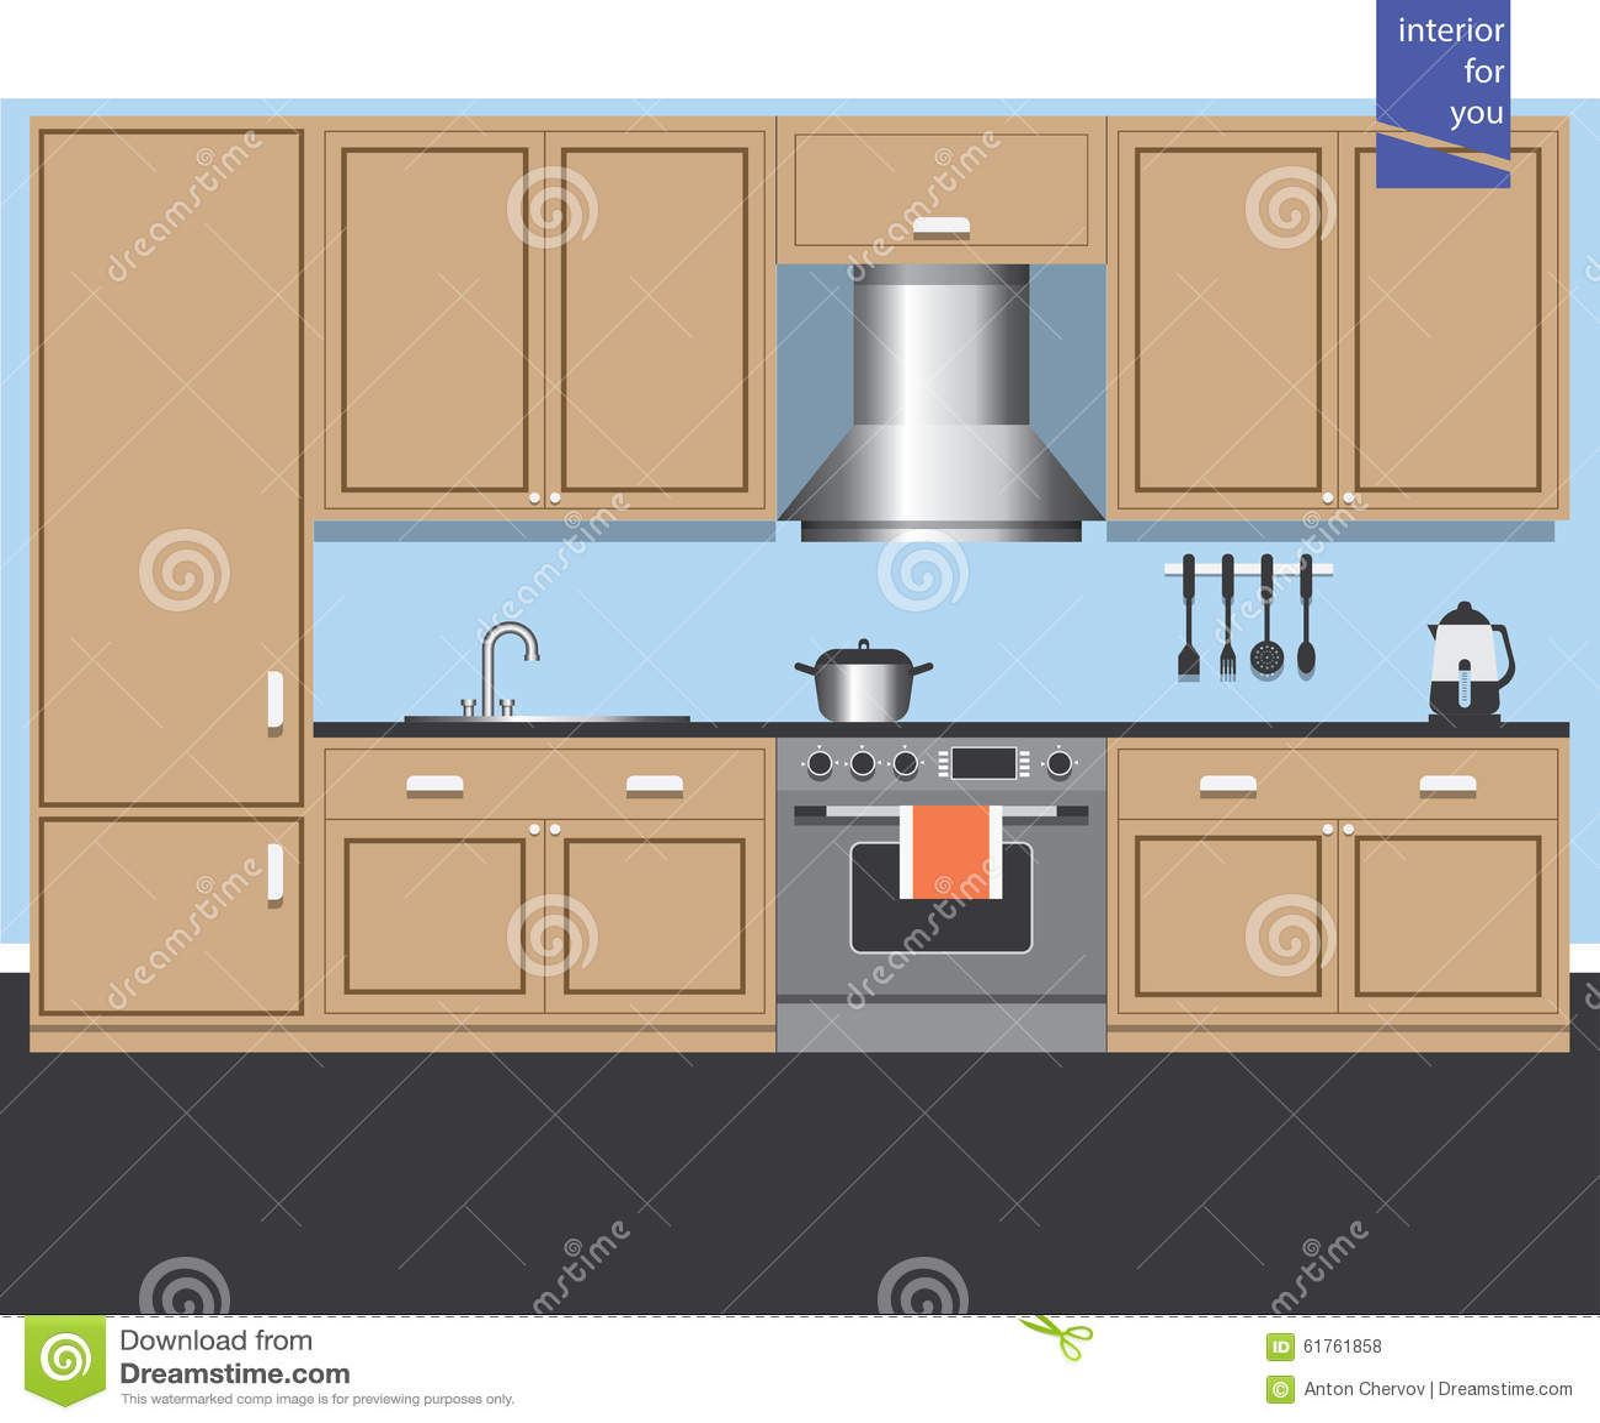 Graphic Kitchen Interior Card Stock Vector Image 61761858